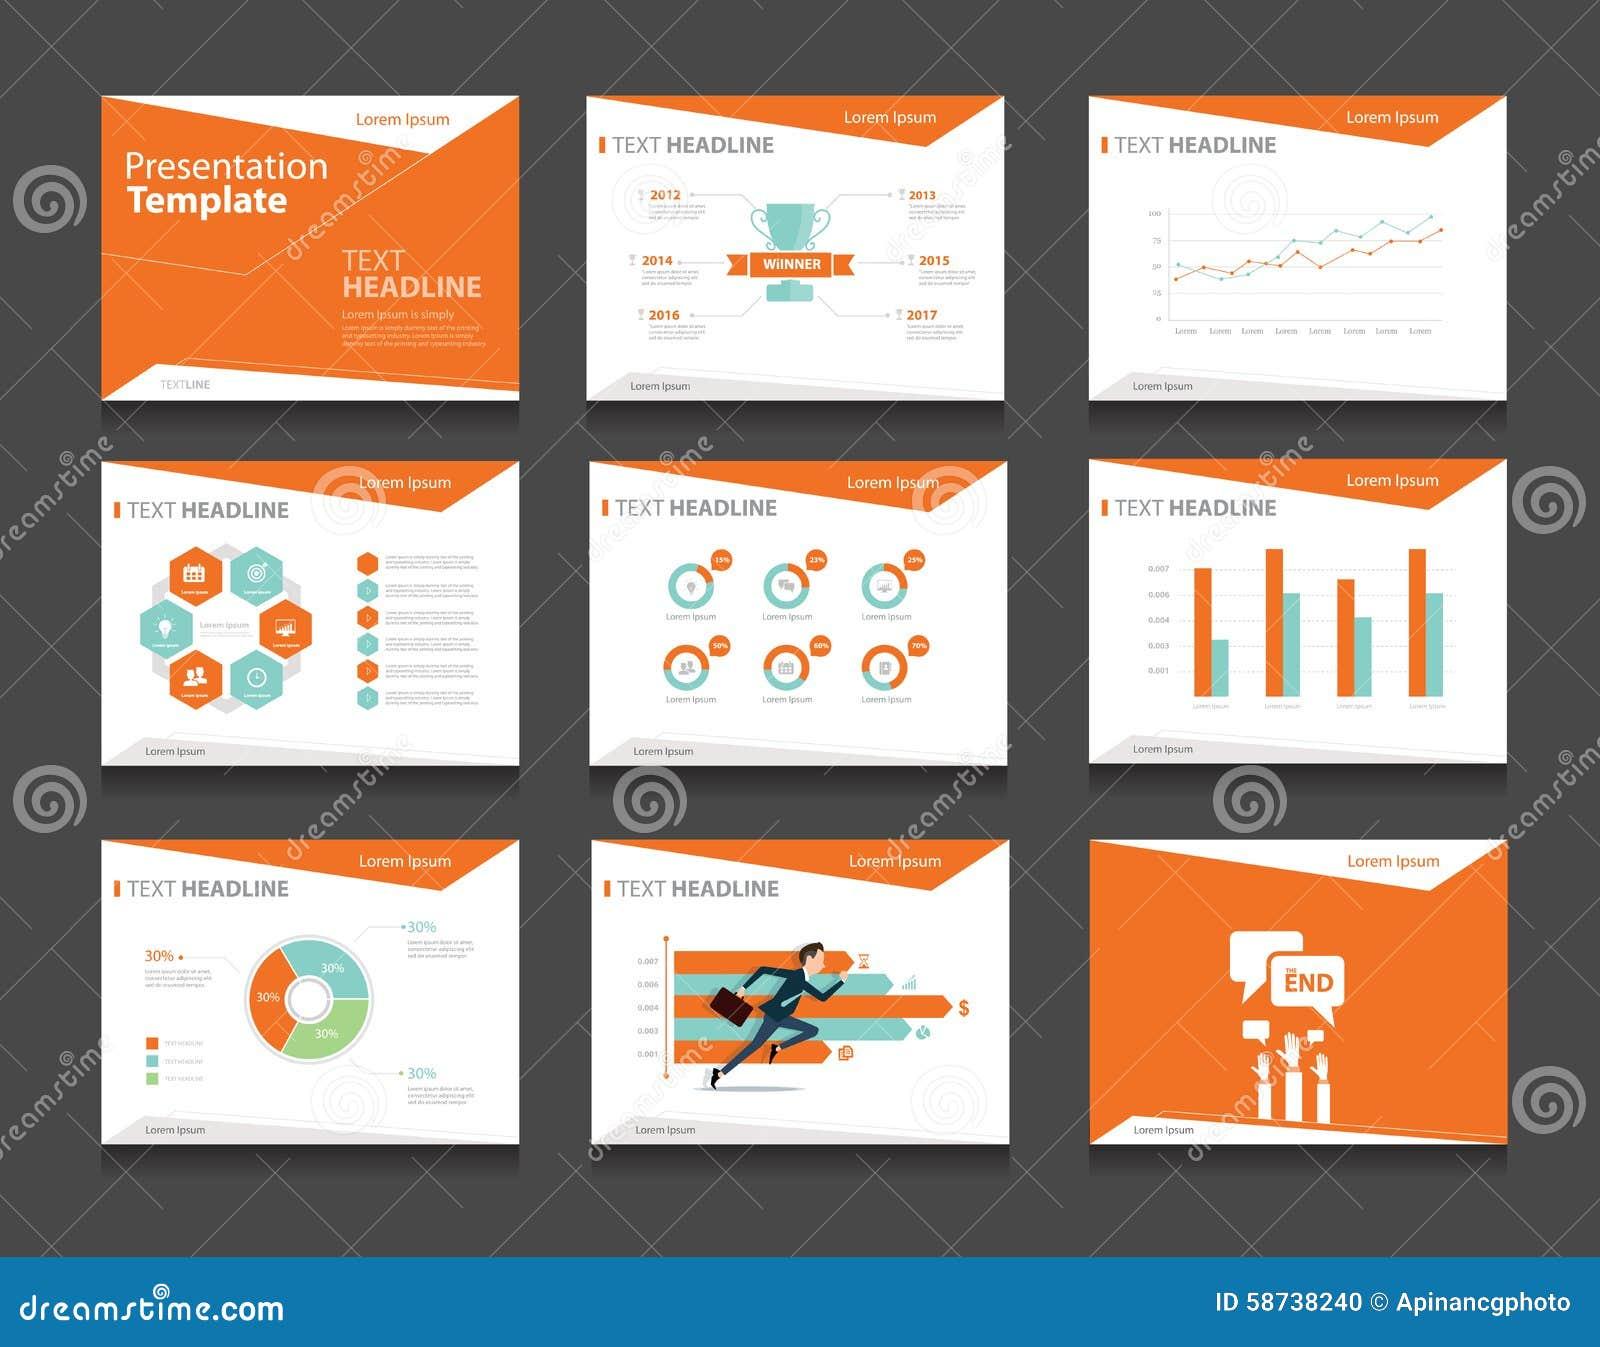 Corporate powerpoint template novasatfm corporate powerpoint template toneelgroepblik Images